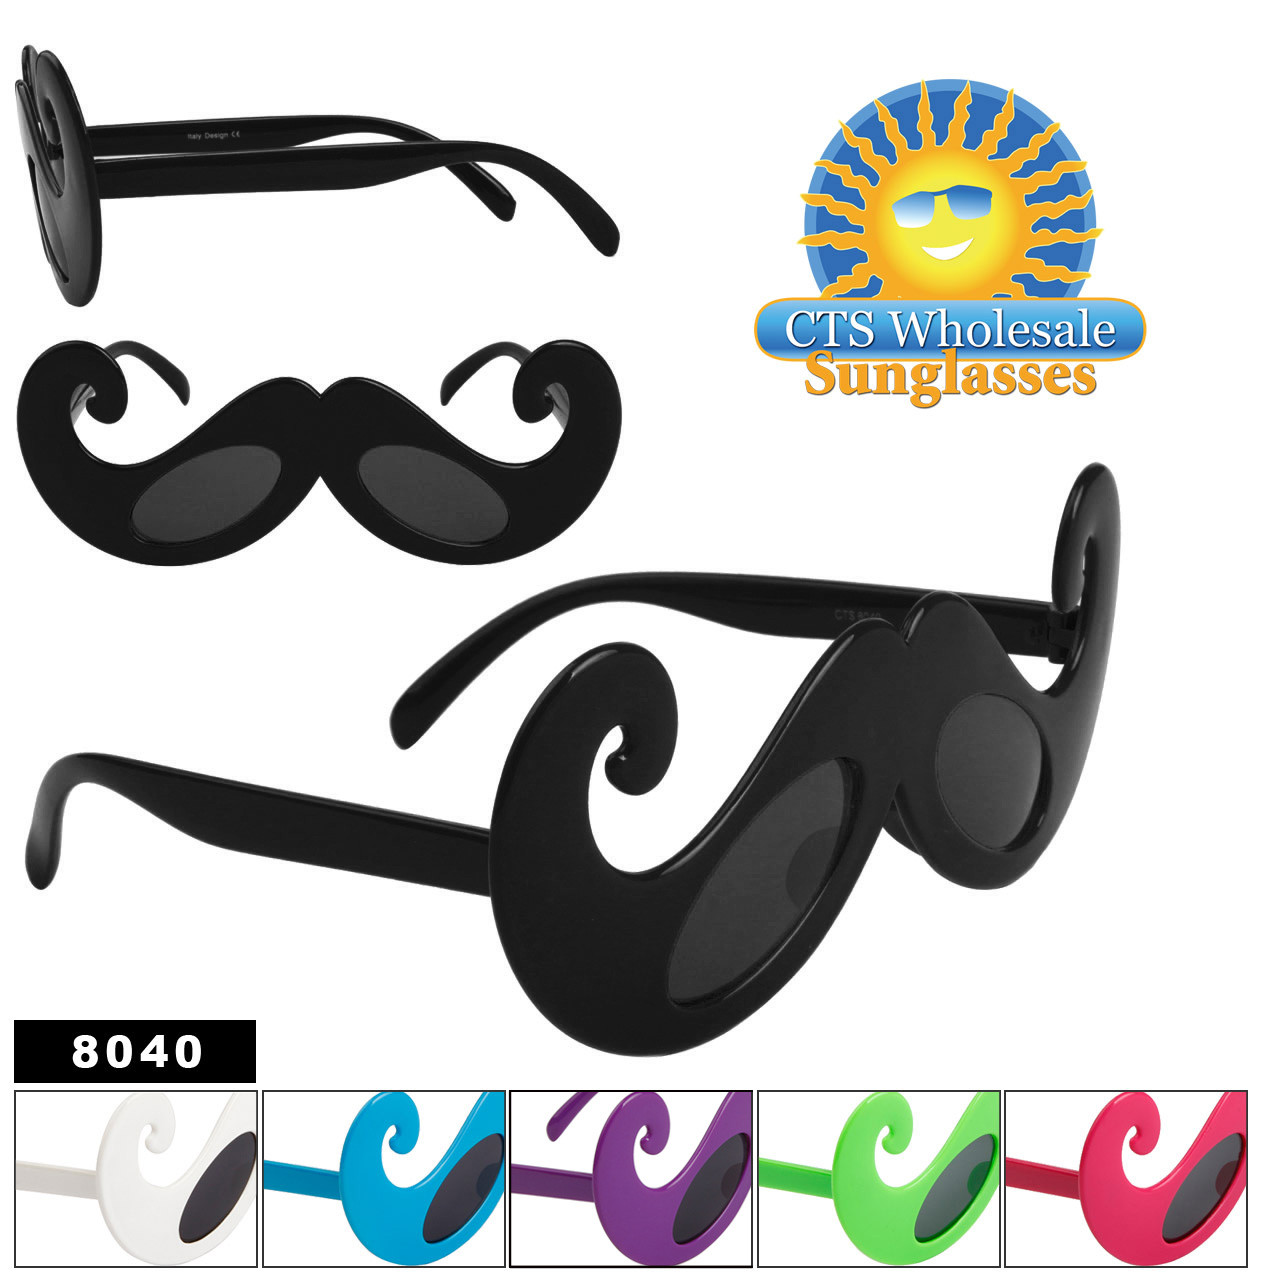 Mustache Sunglasses Wholesale - Style # 8040